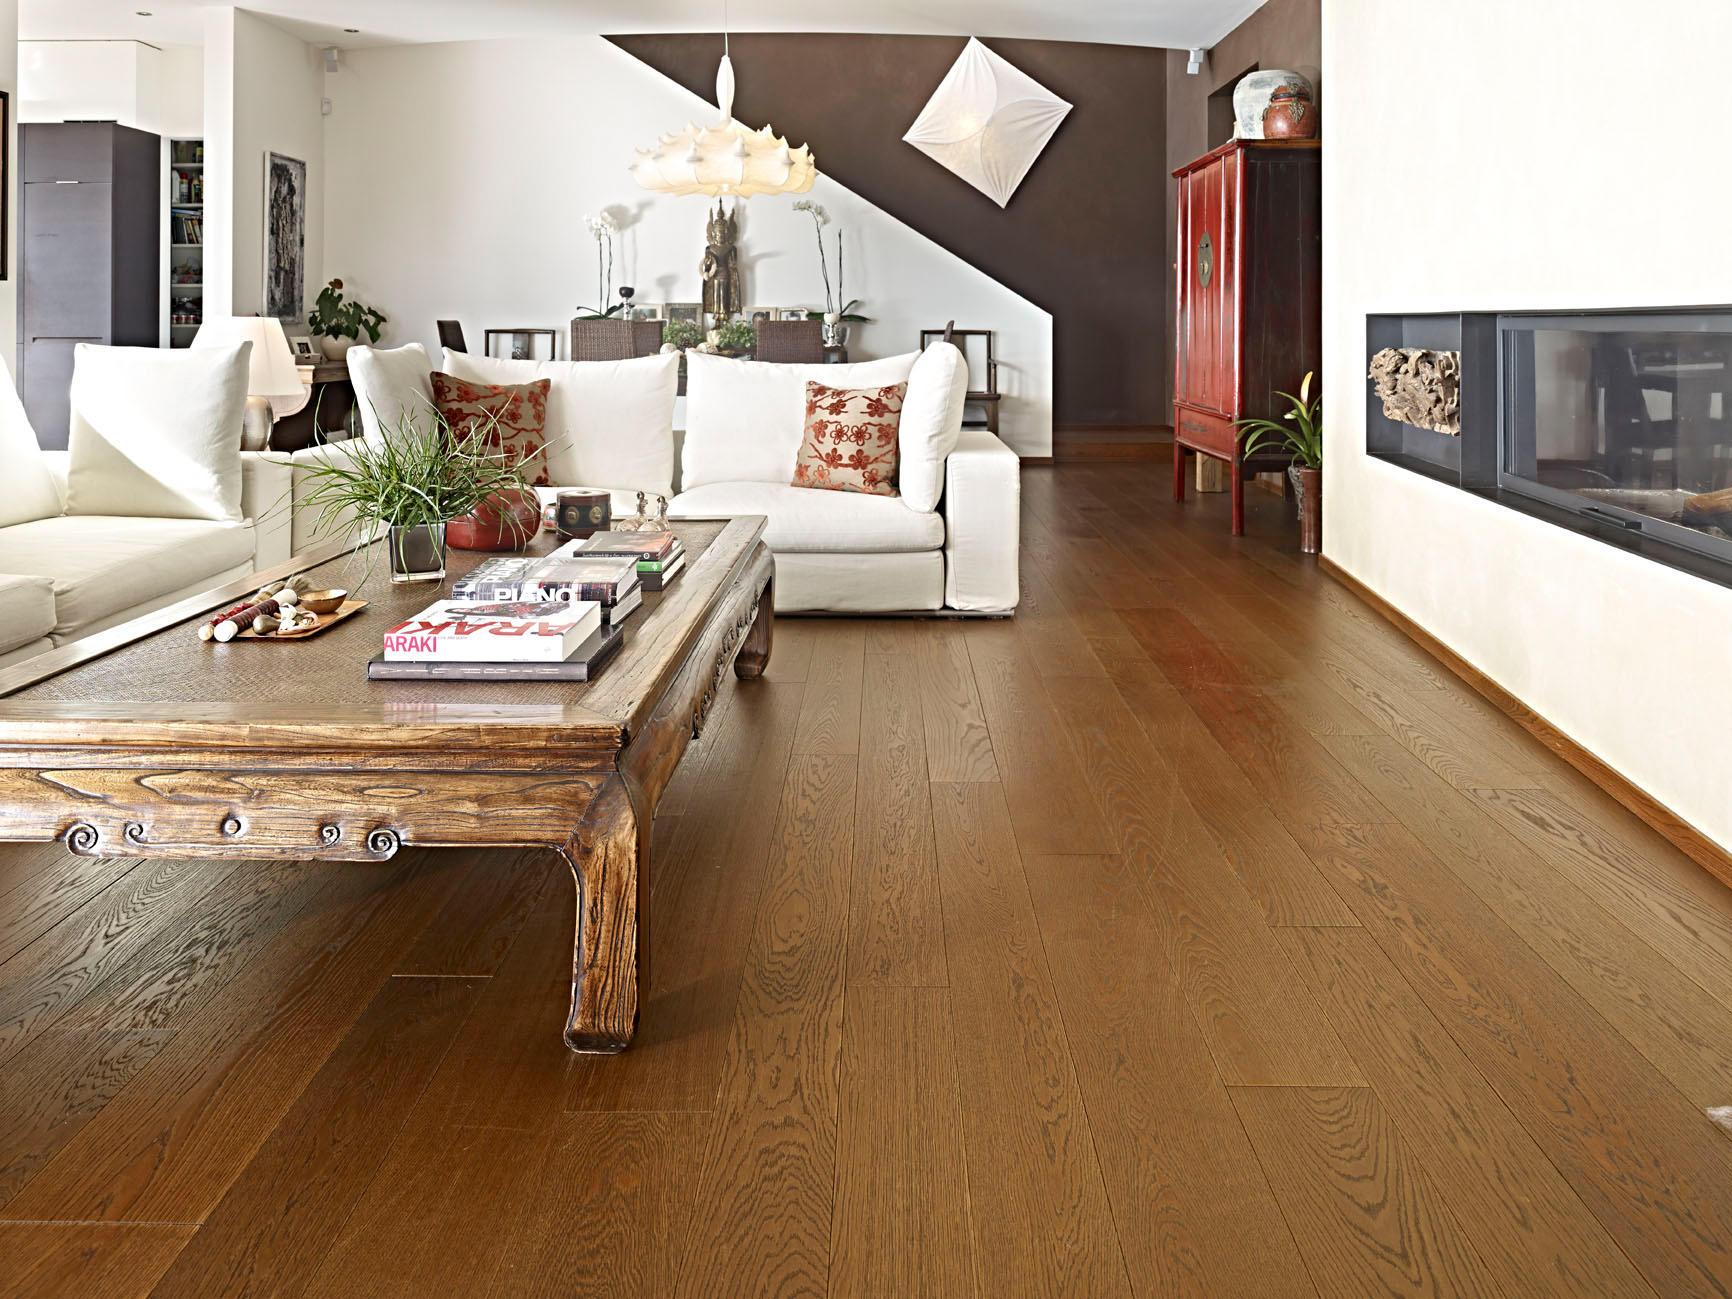 Boschi di fiemme cil pavimenti in legno di fiemme for Pavimenti di 3000 piedi quadrati